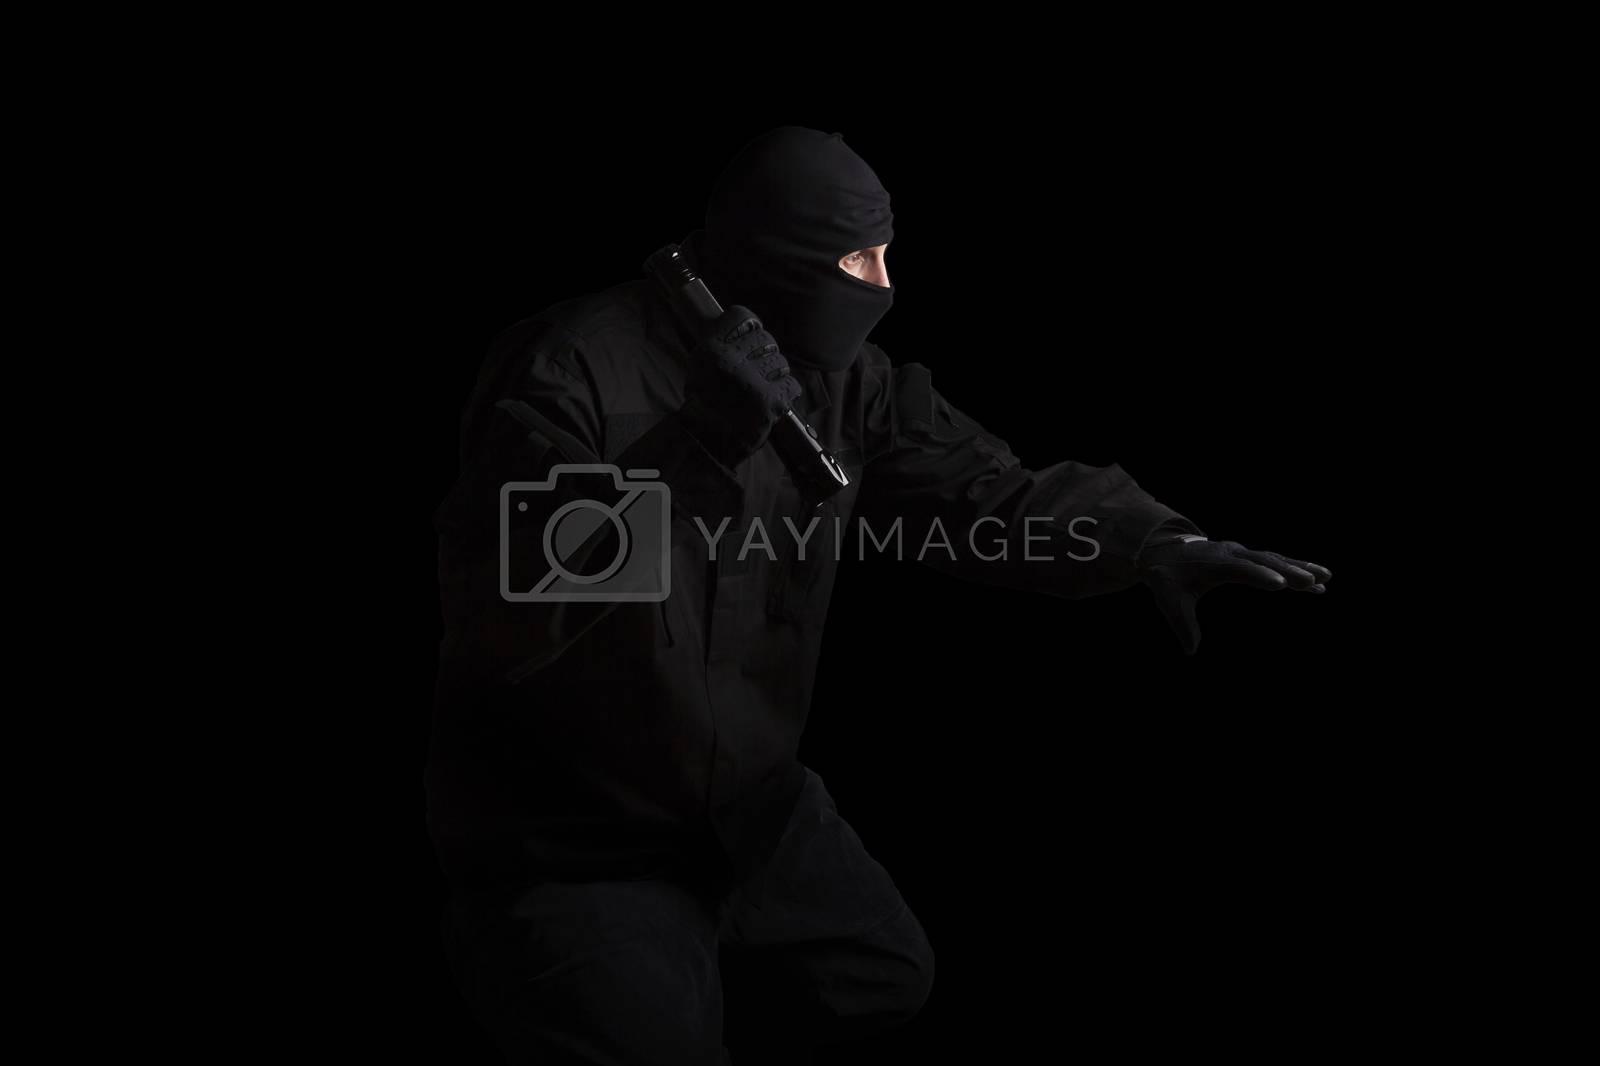 Man in black mask and black cloth holding flashlight isolated on black background. Dangerous criminal committing crime.